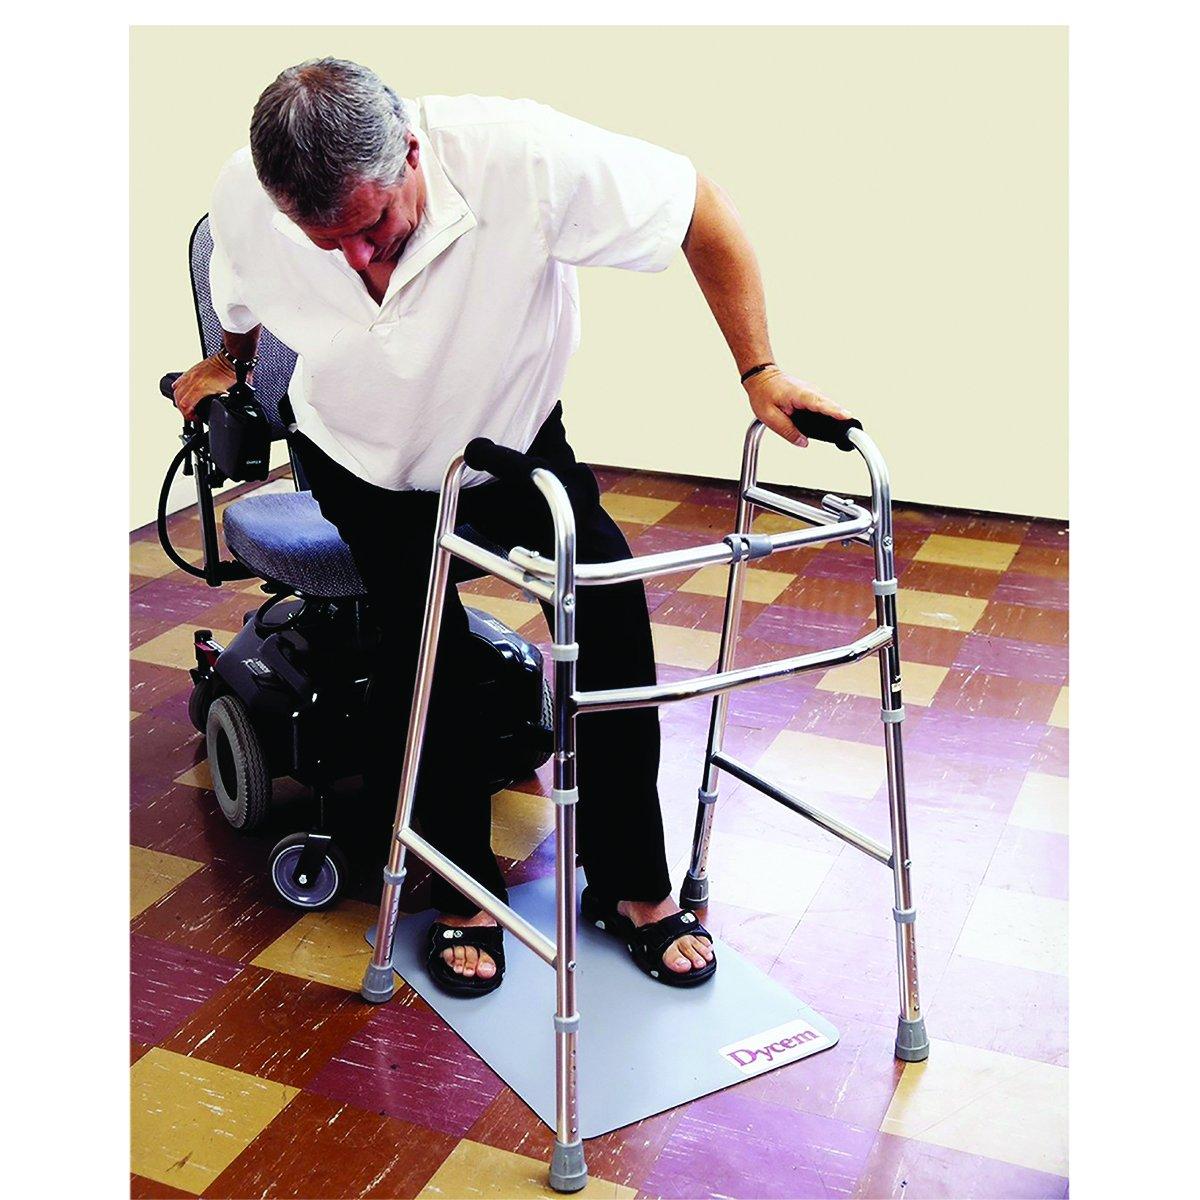 Dycem 50-1641B Non-Slip Safety Floor mat, 18 x 24, Blue 18 x 24 Fabrication Enterprises